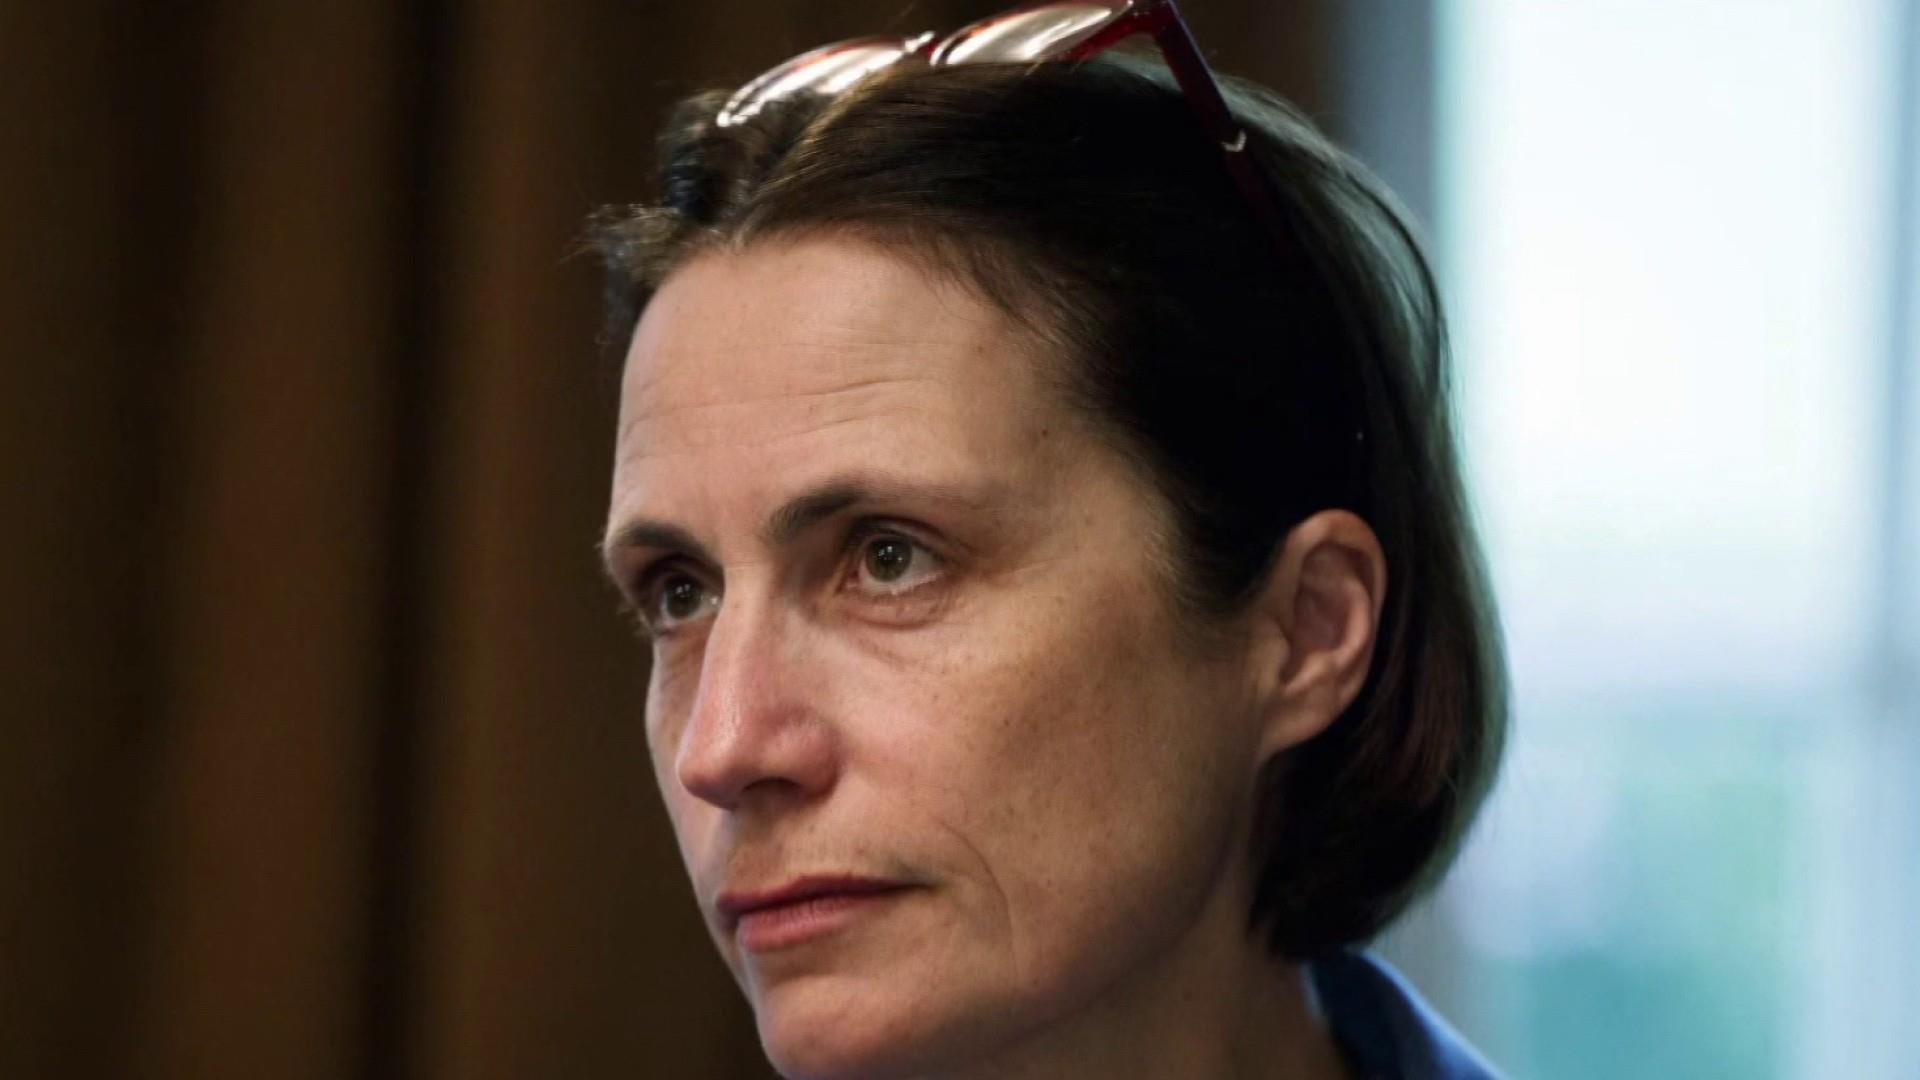 Trump's former Russia aide set to give revealing testimony on Giuliani, Sondland